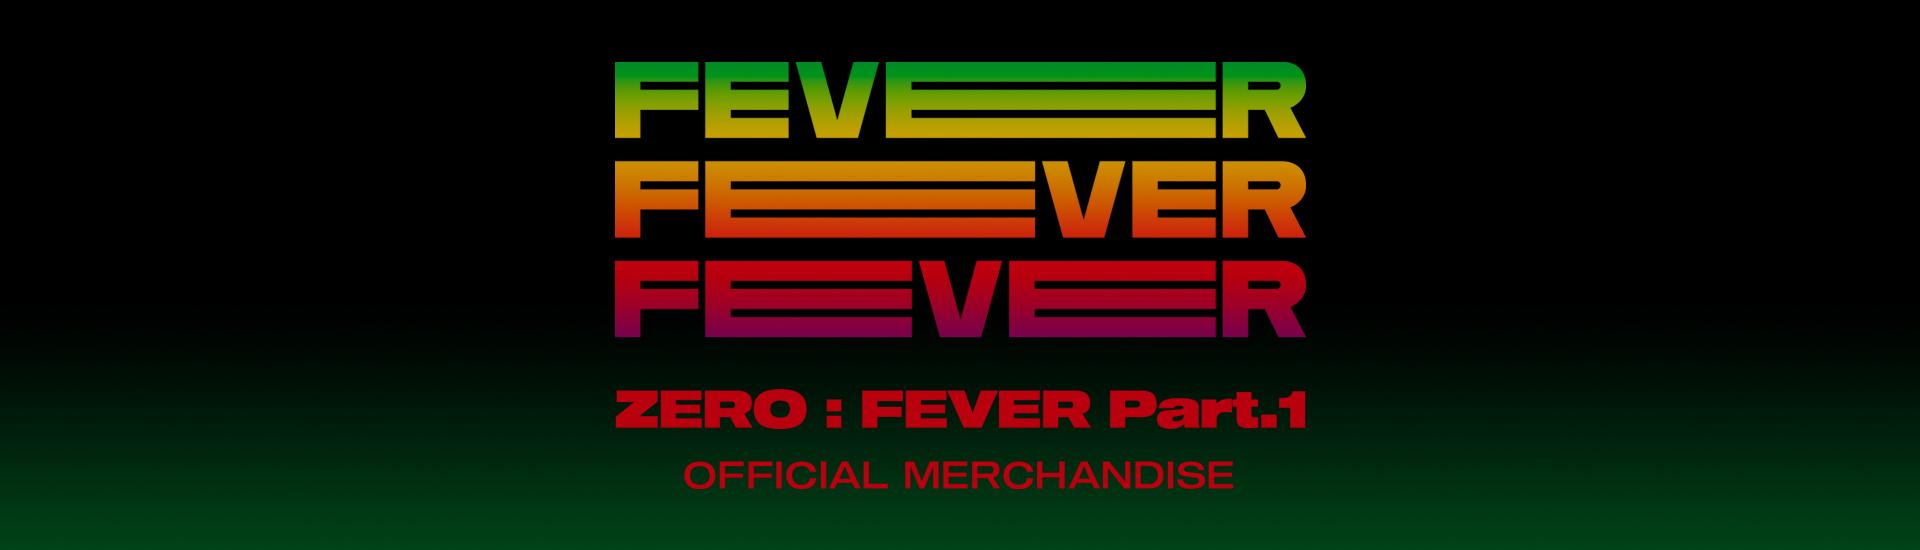 ATEEZ - ZERO : FEVER Part.1 OFFICIAL MERCHANDISE (ACCESSORIES)